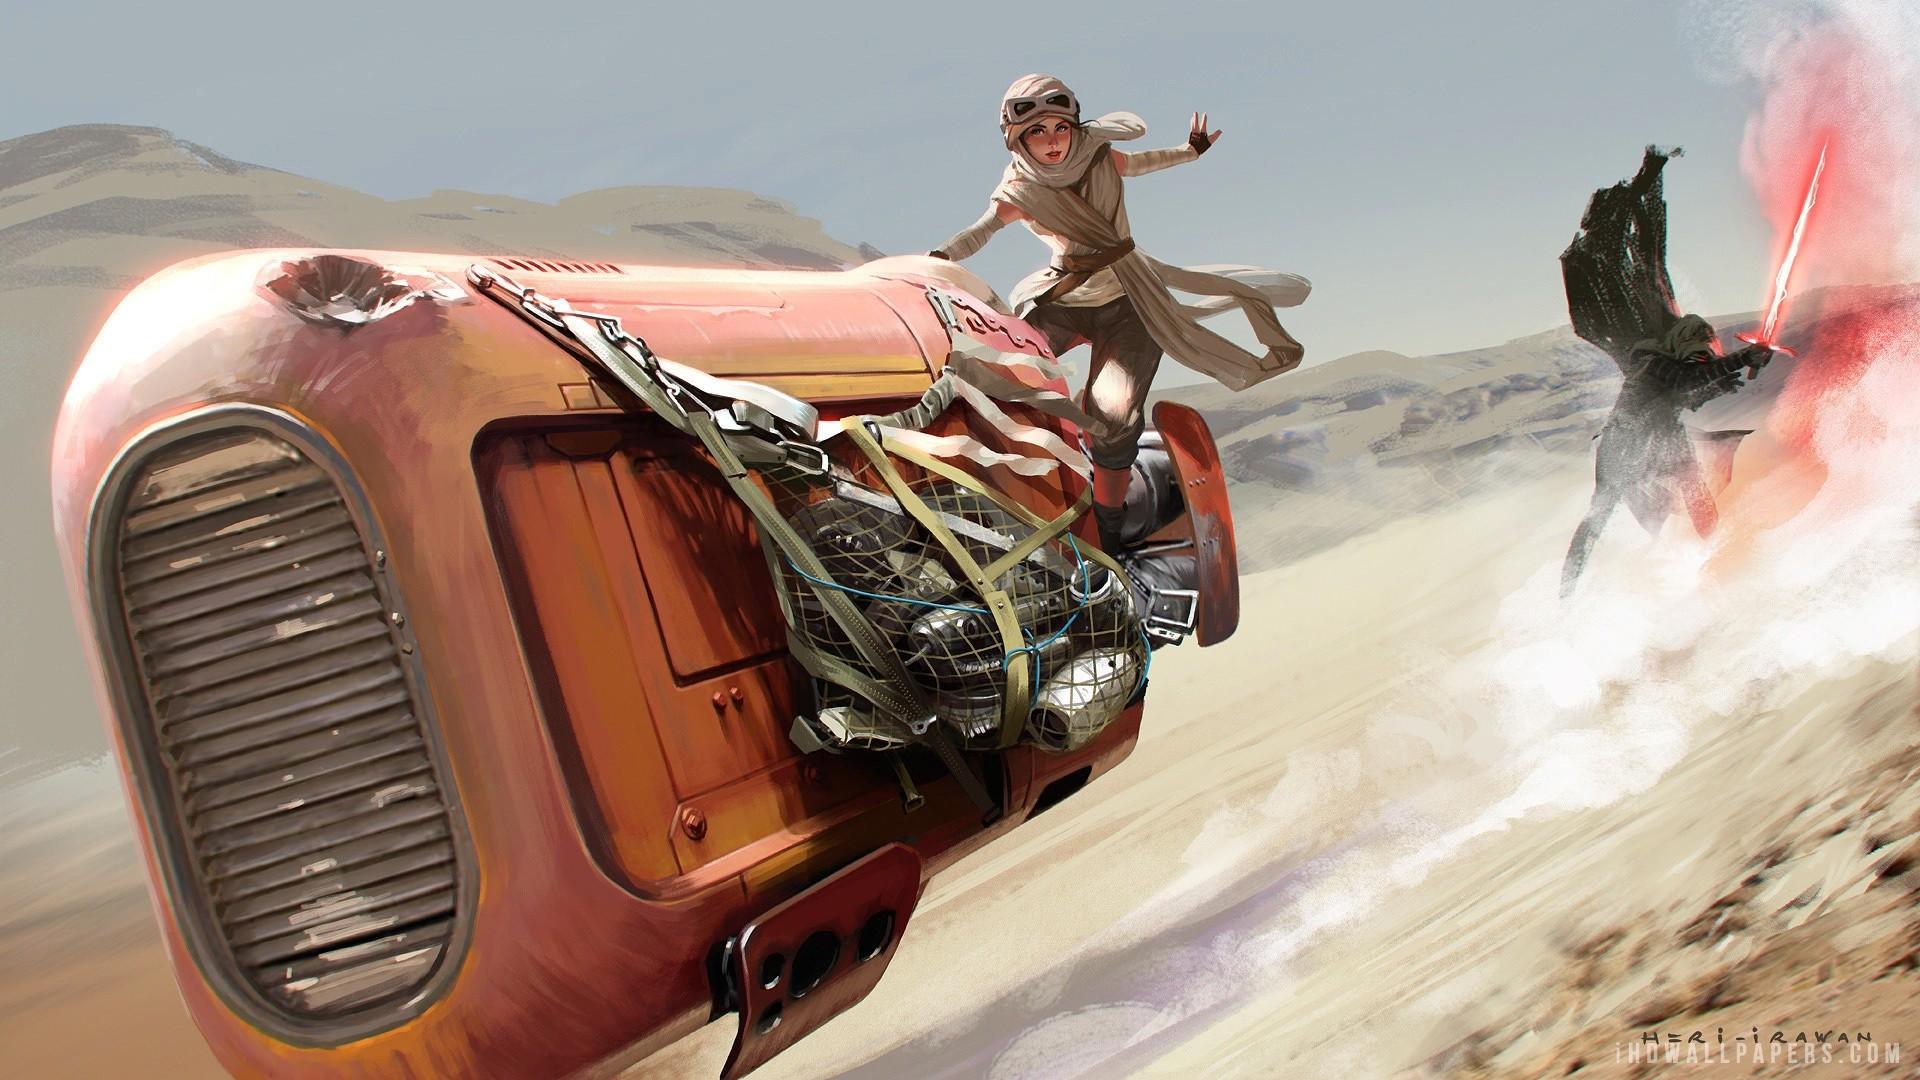 Rey Kylo Ren Star Wars Force Awakens HD Wallpaper – iHD Wallpapers